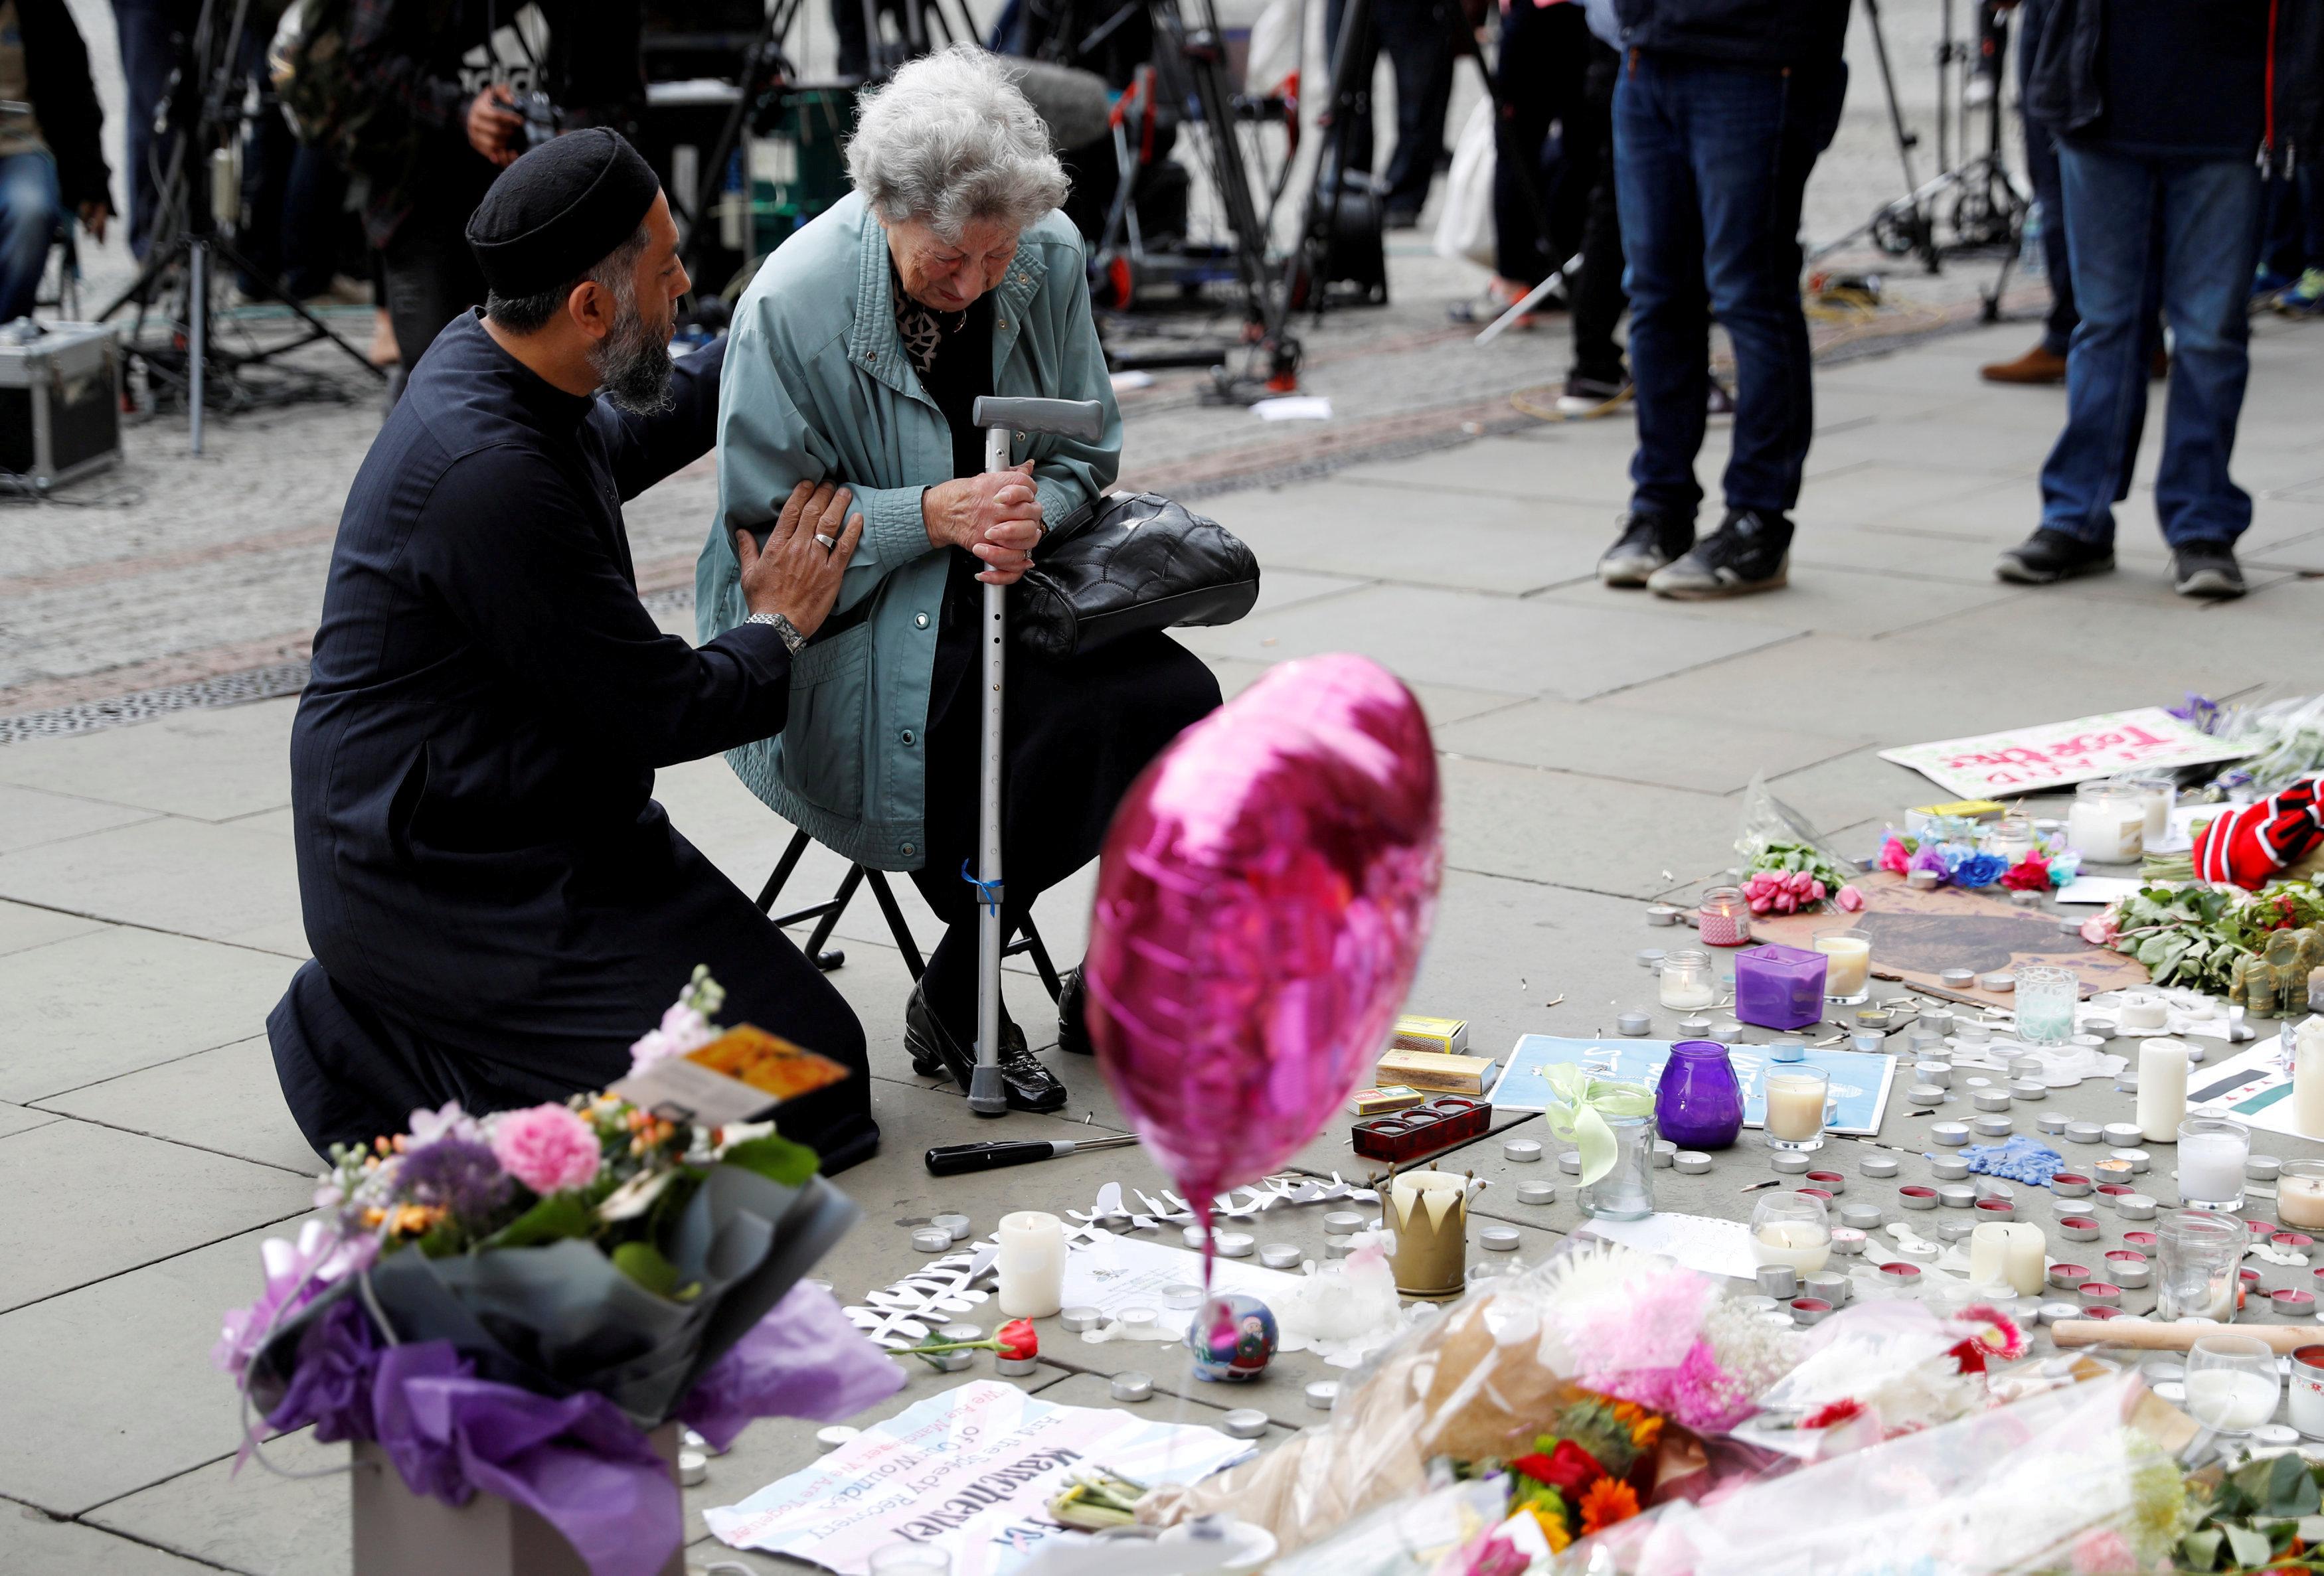 A Muslim man named Sadiq Patel comforts a Jewish woman named Renee Rachel Black next to floral tributes in Albert Square in Manchester, Britain May 24, 2017. REUTERS/Darren Staples